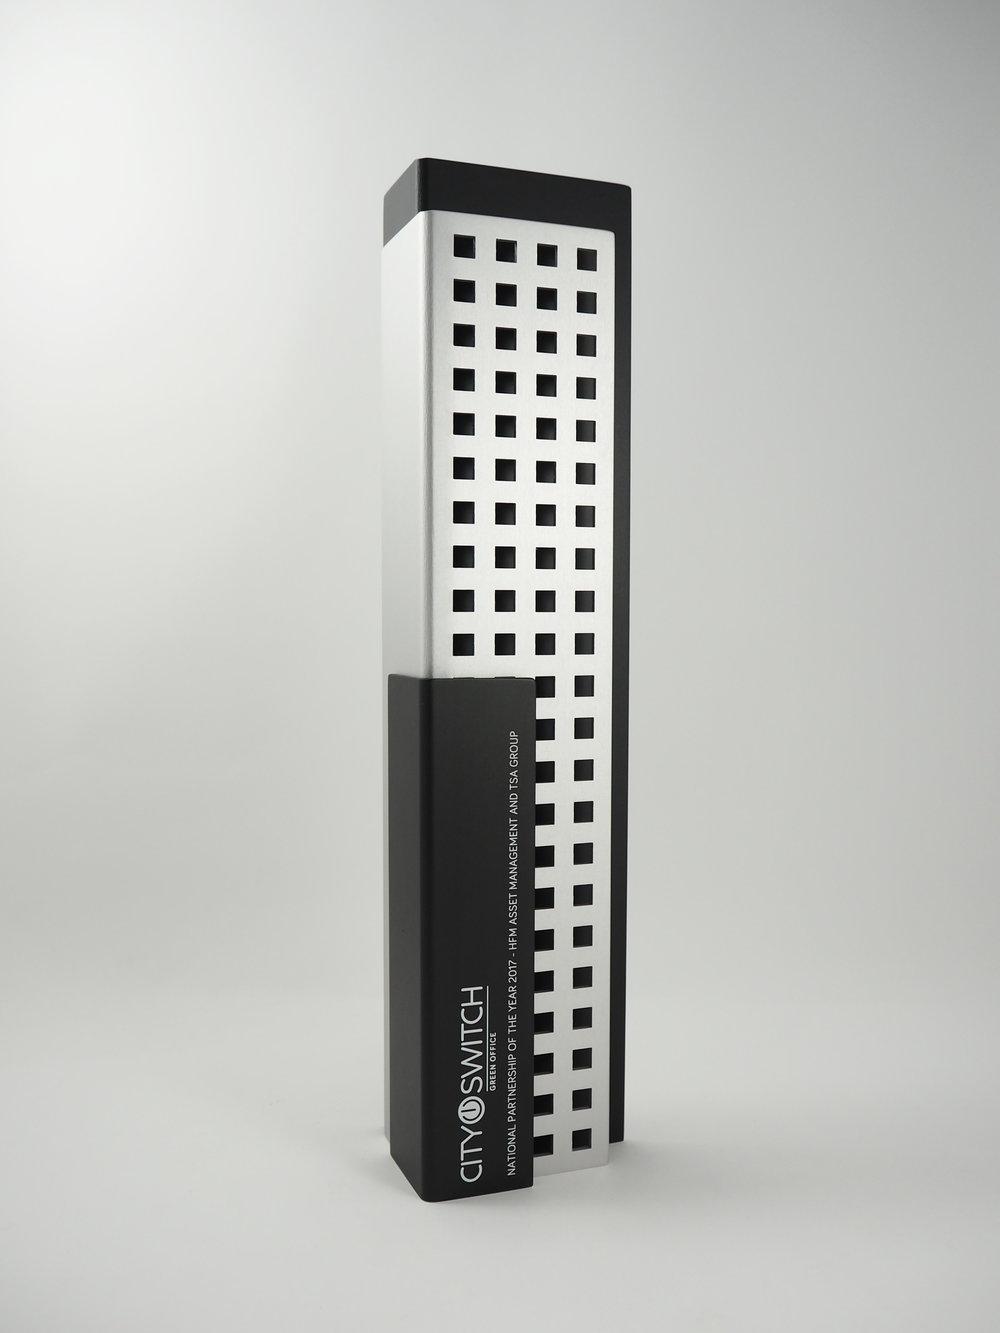 cityswitch-aluminium-corporate-trophy-award-01.jpg